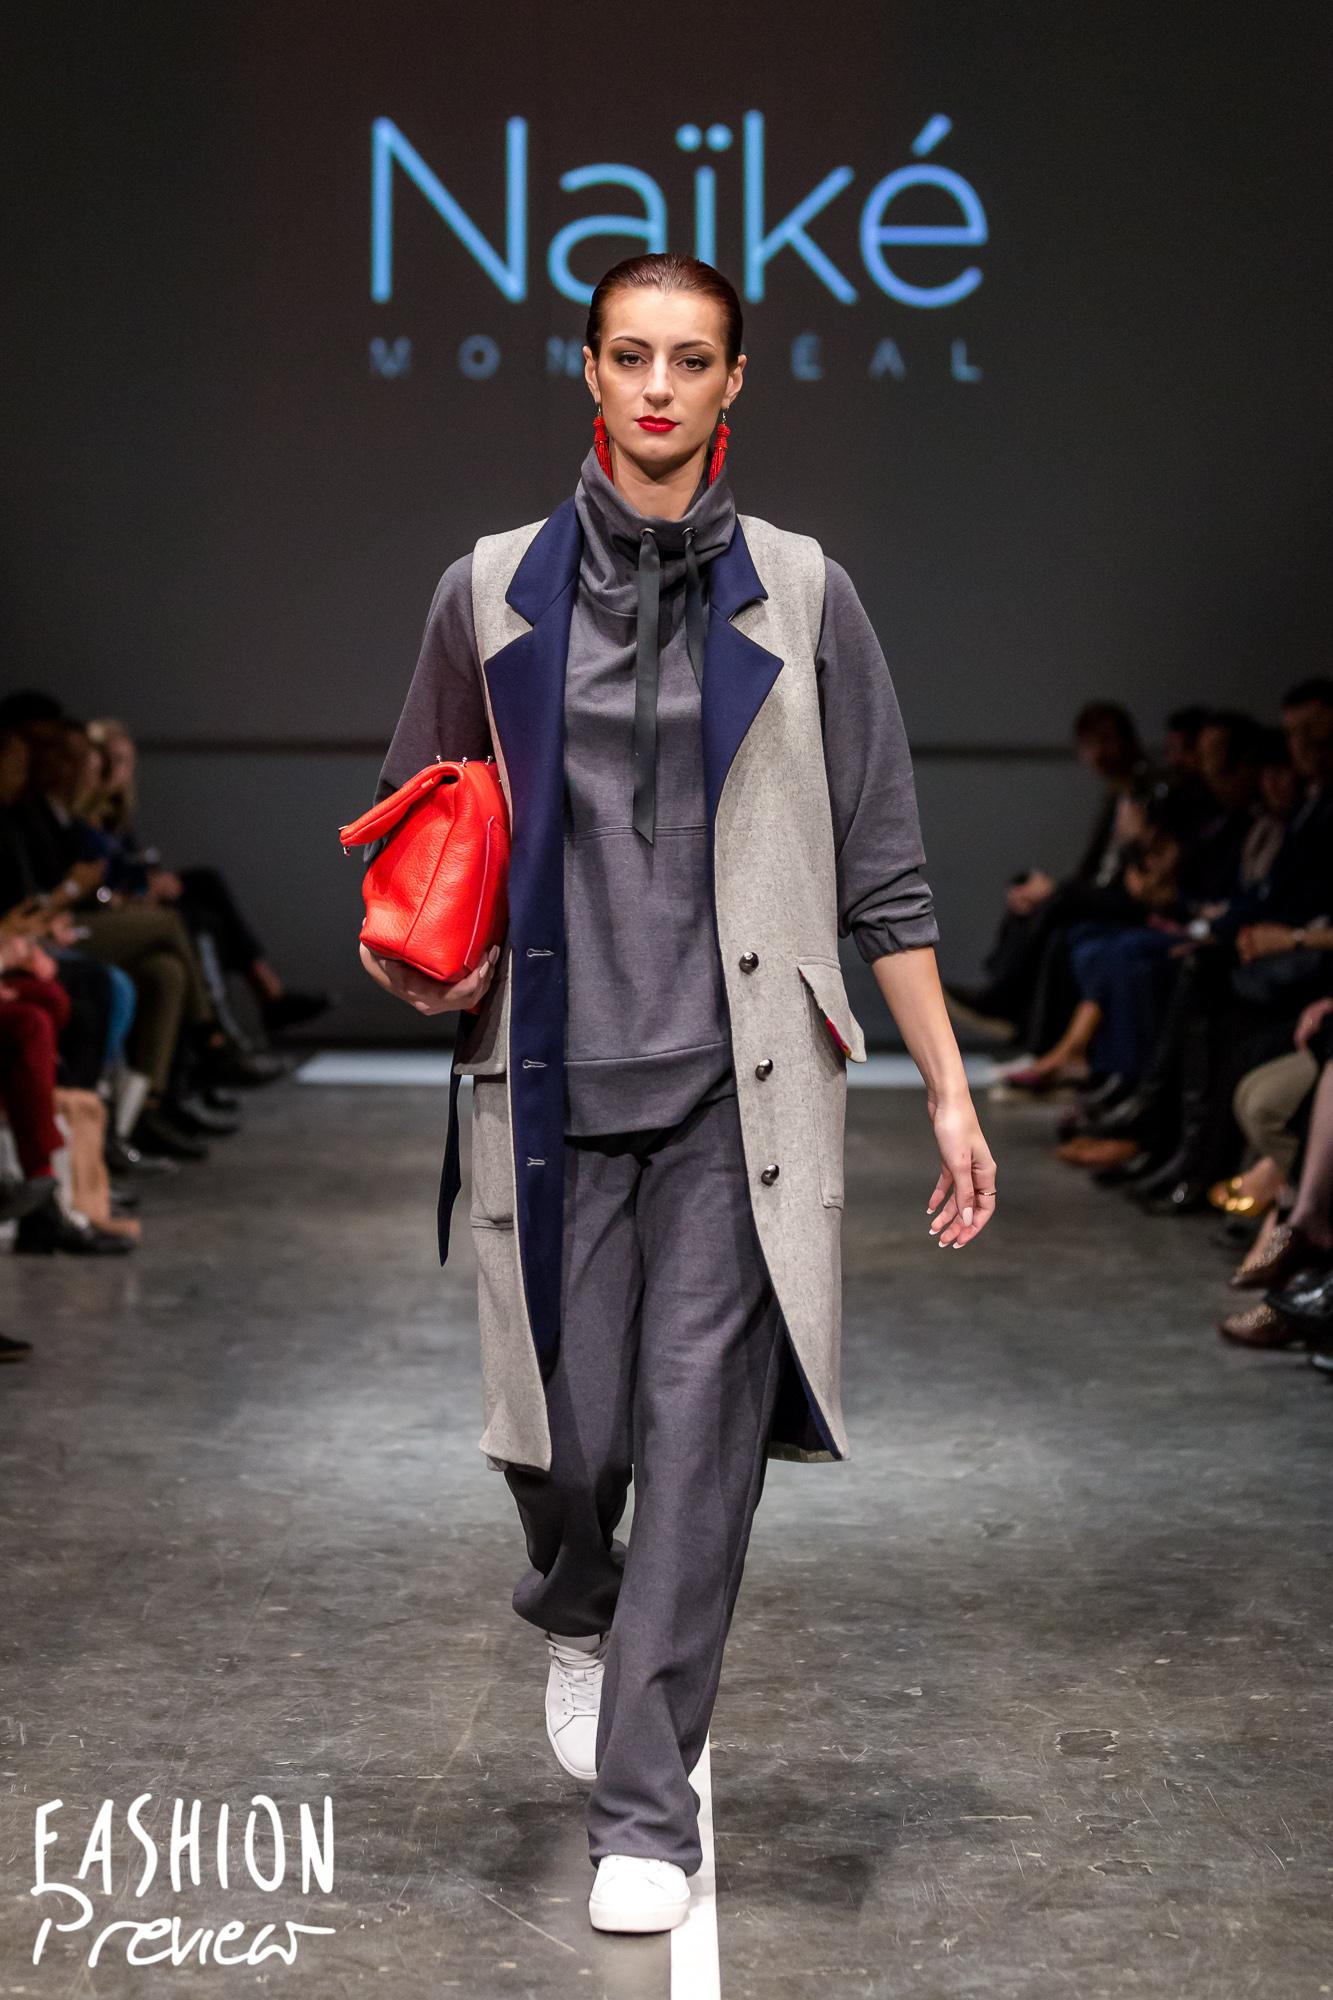 Fashion Preview 9 - Naike-26.jpg